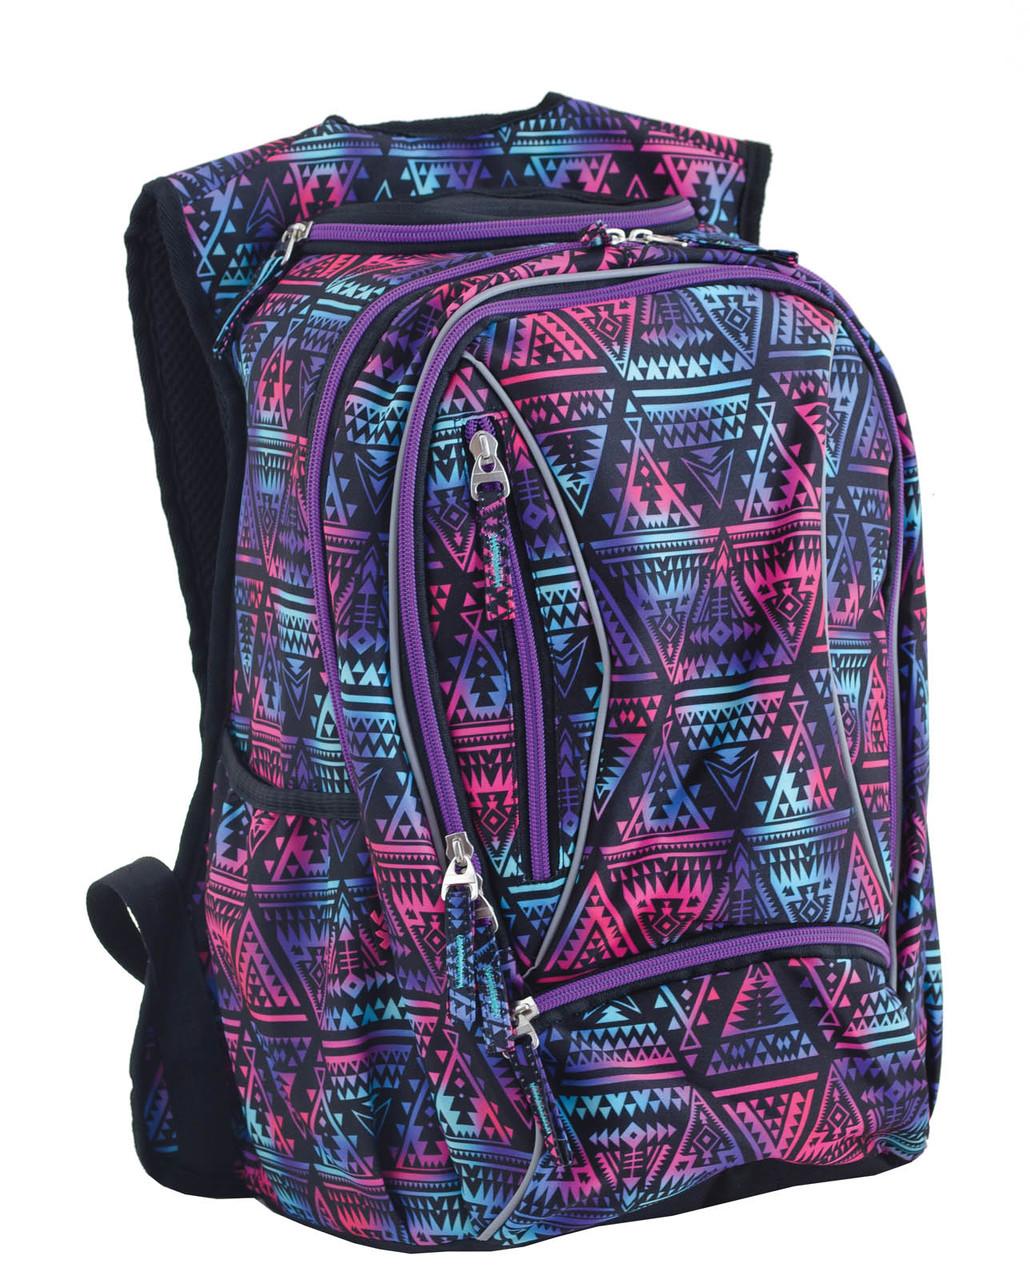 553158 Подростковый рюкзак YES T-28 Magnet 40*25,5*20